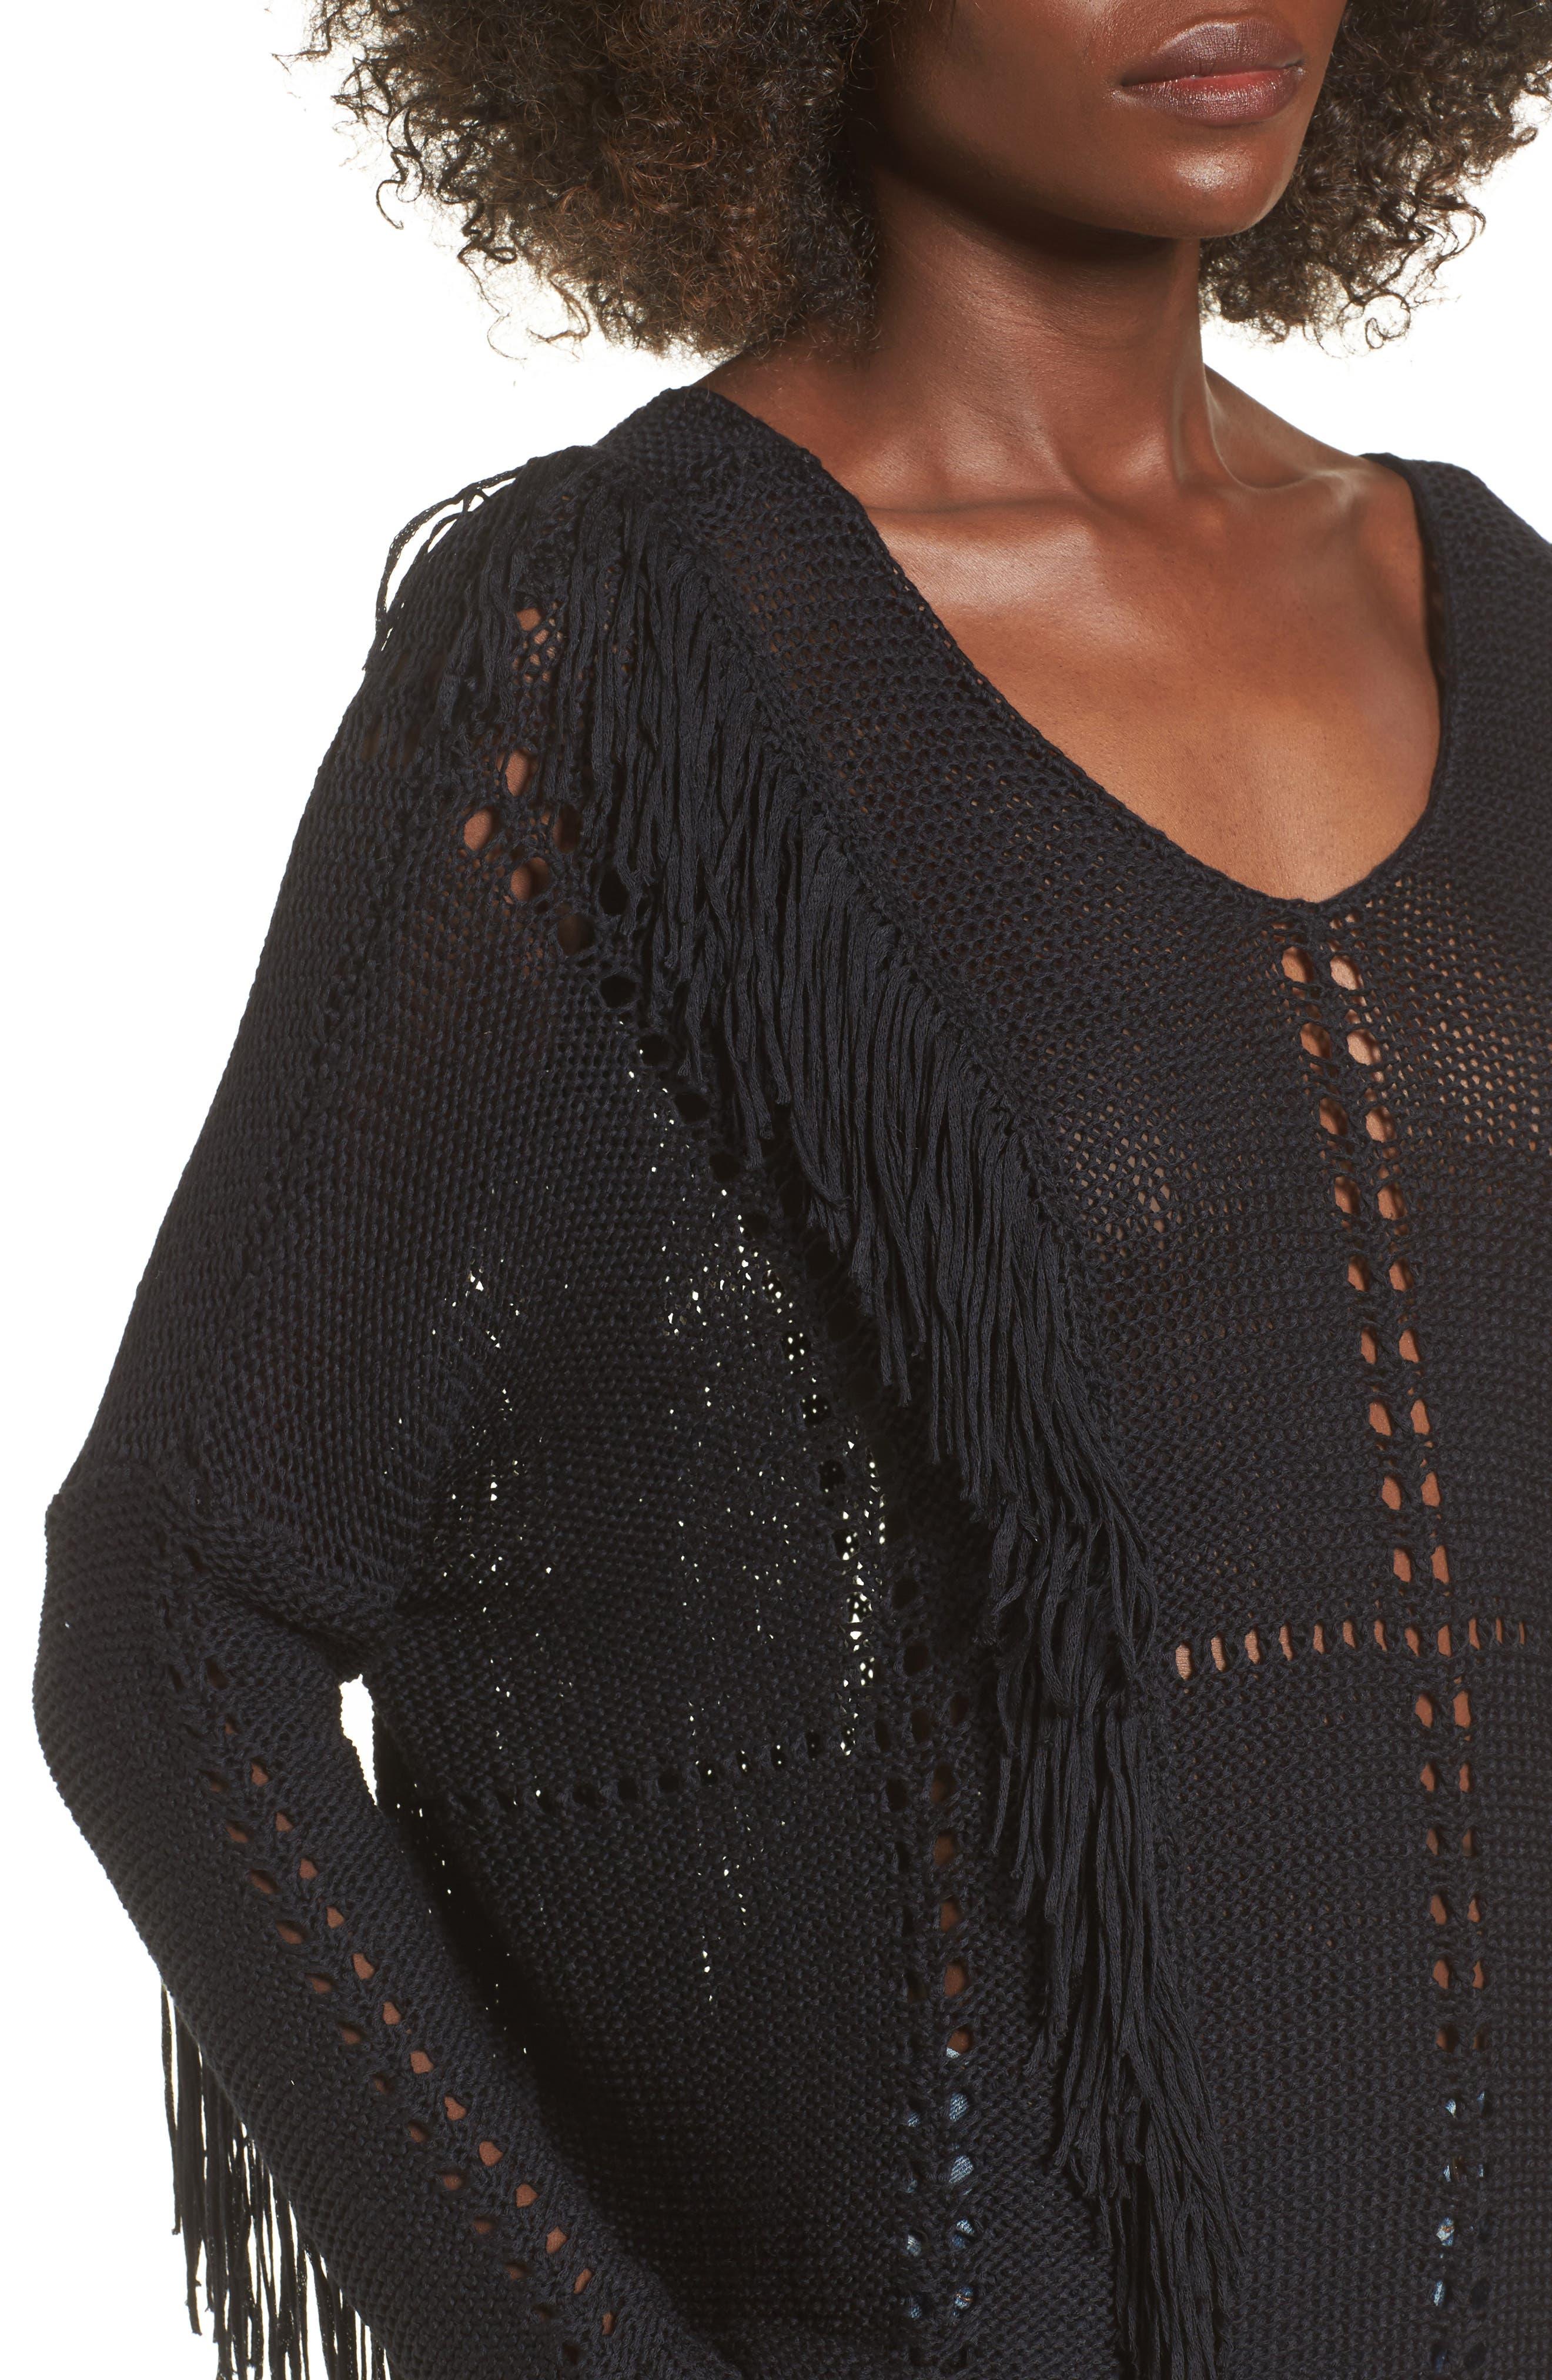 Enya Fringe Sweater,                             Alternate thumbnail 4, color,                             Black